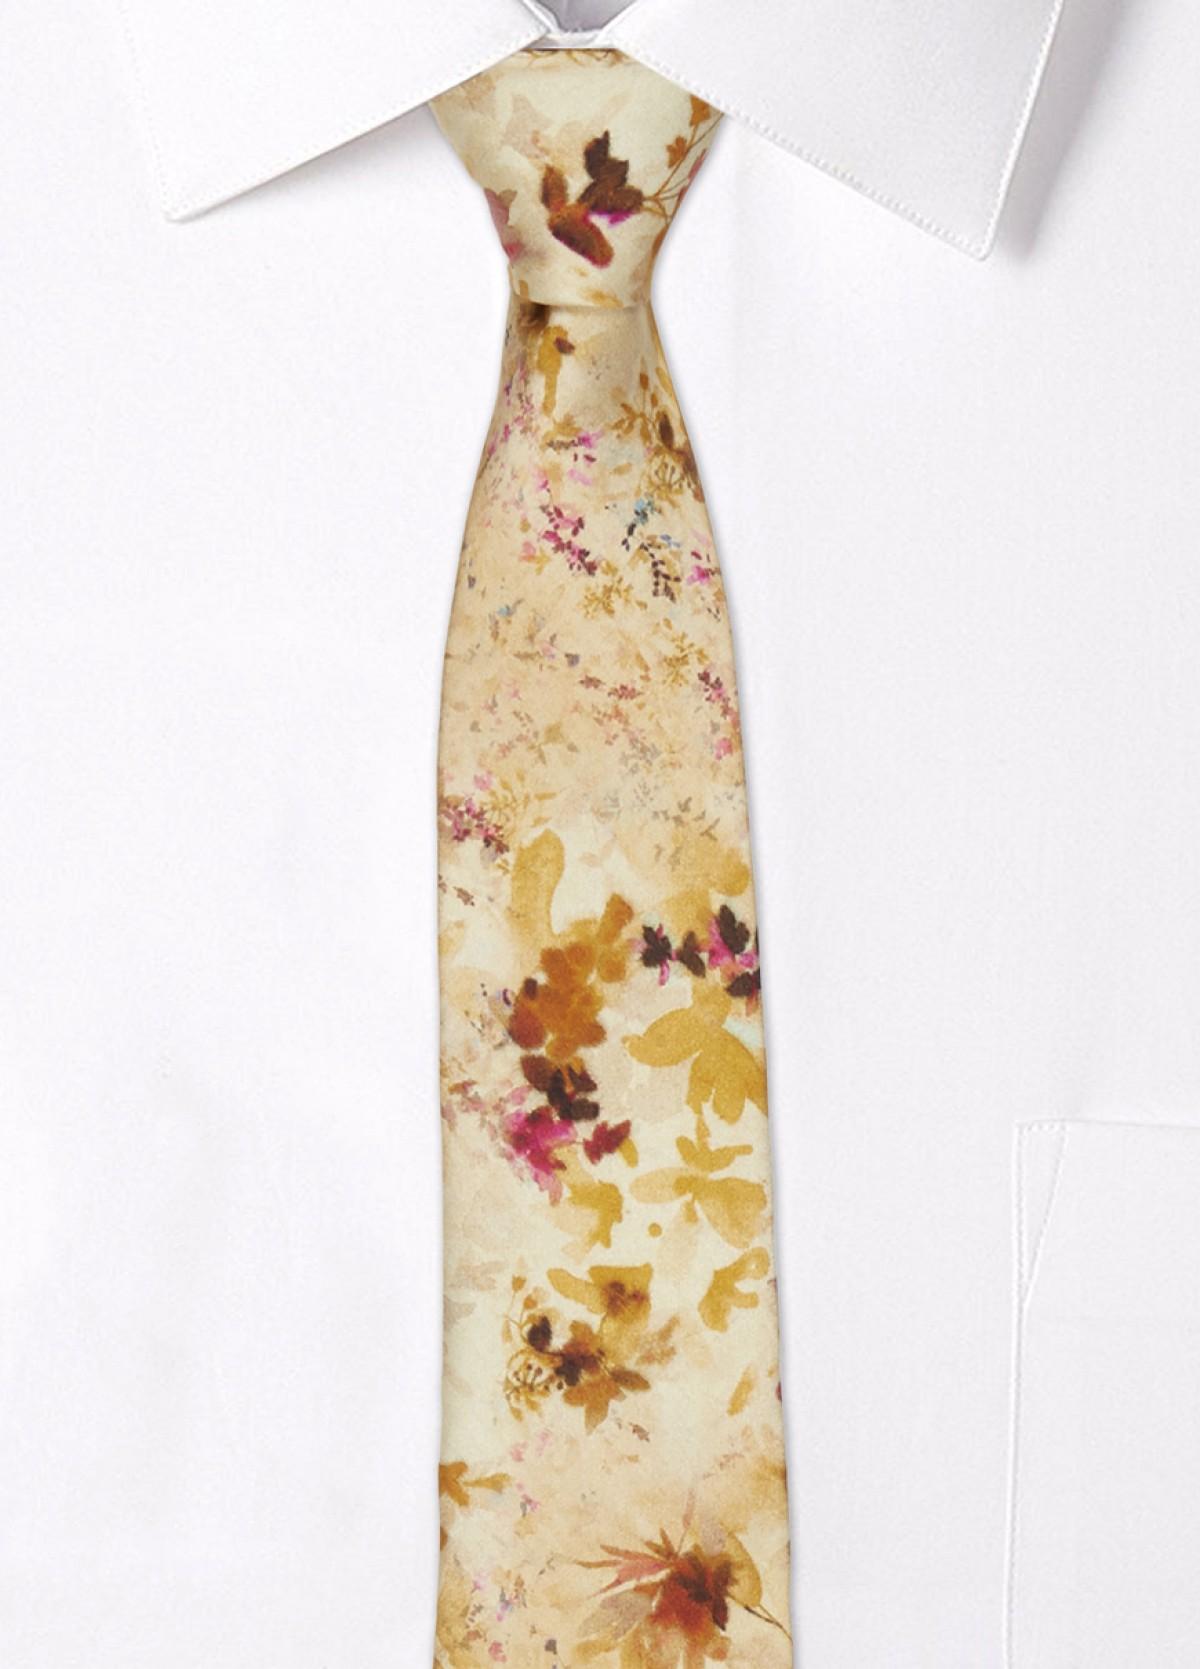 The Printed Silk Tie